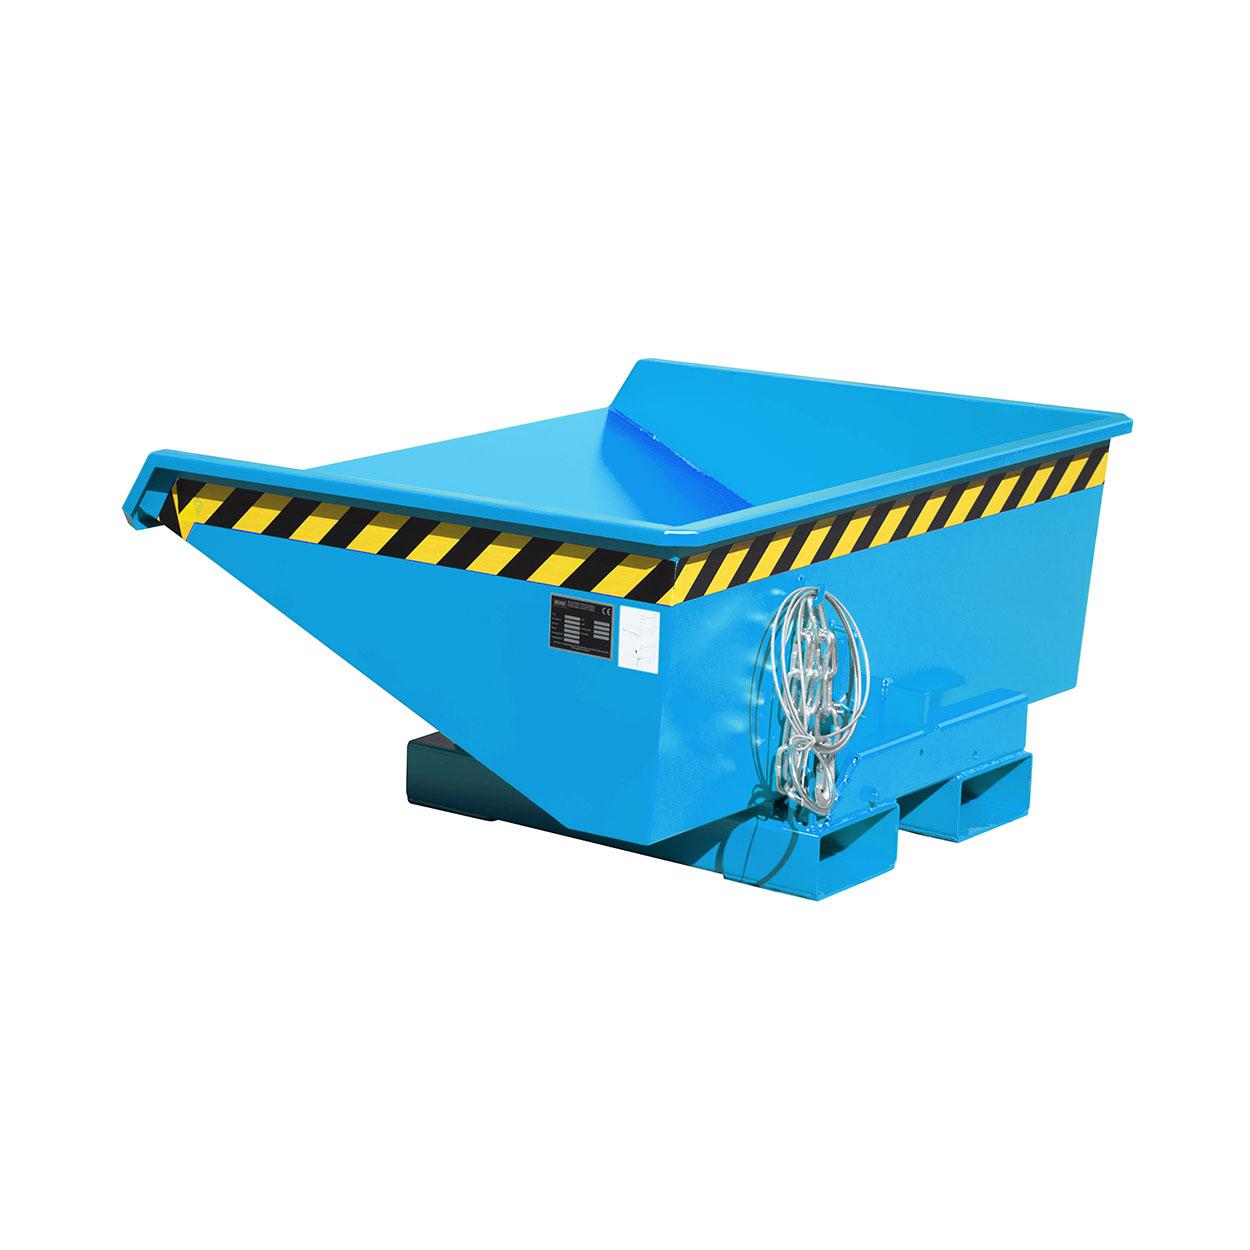 Výklopný kontejner ROLO MINI